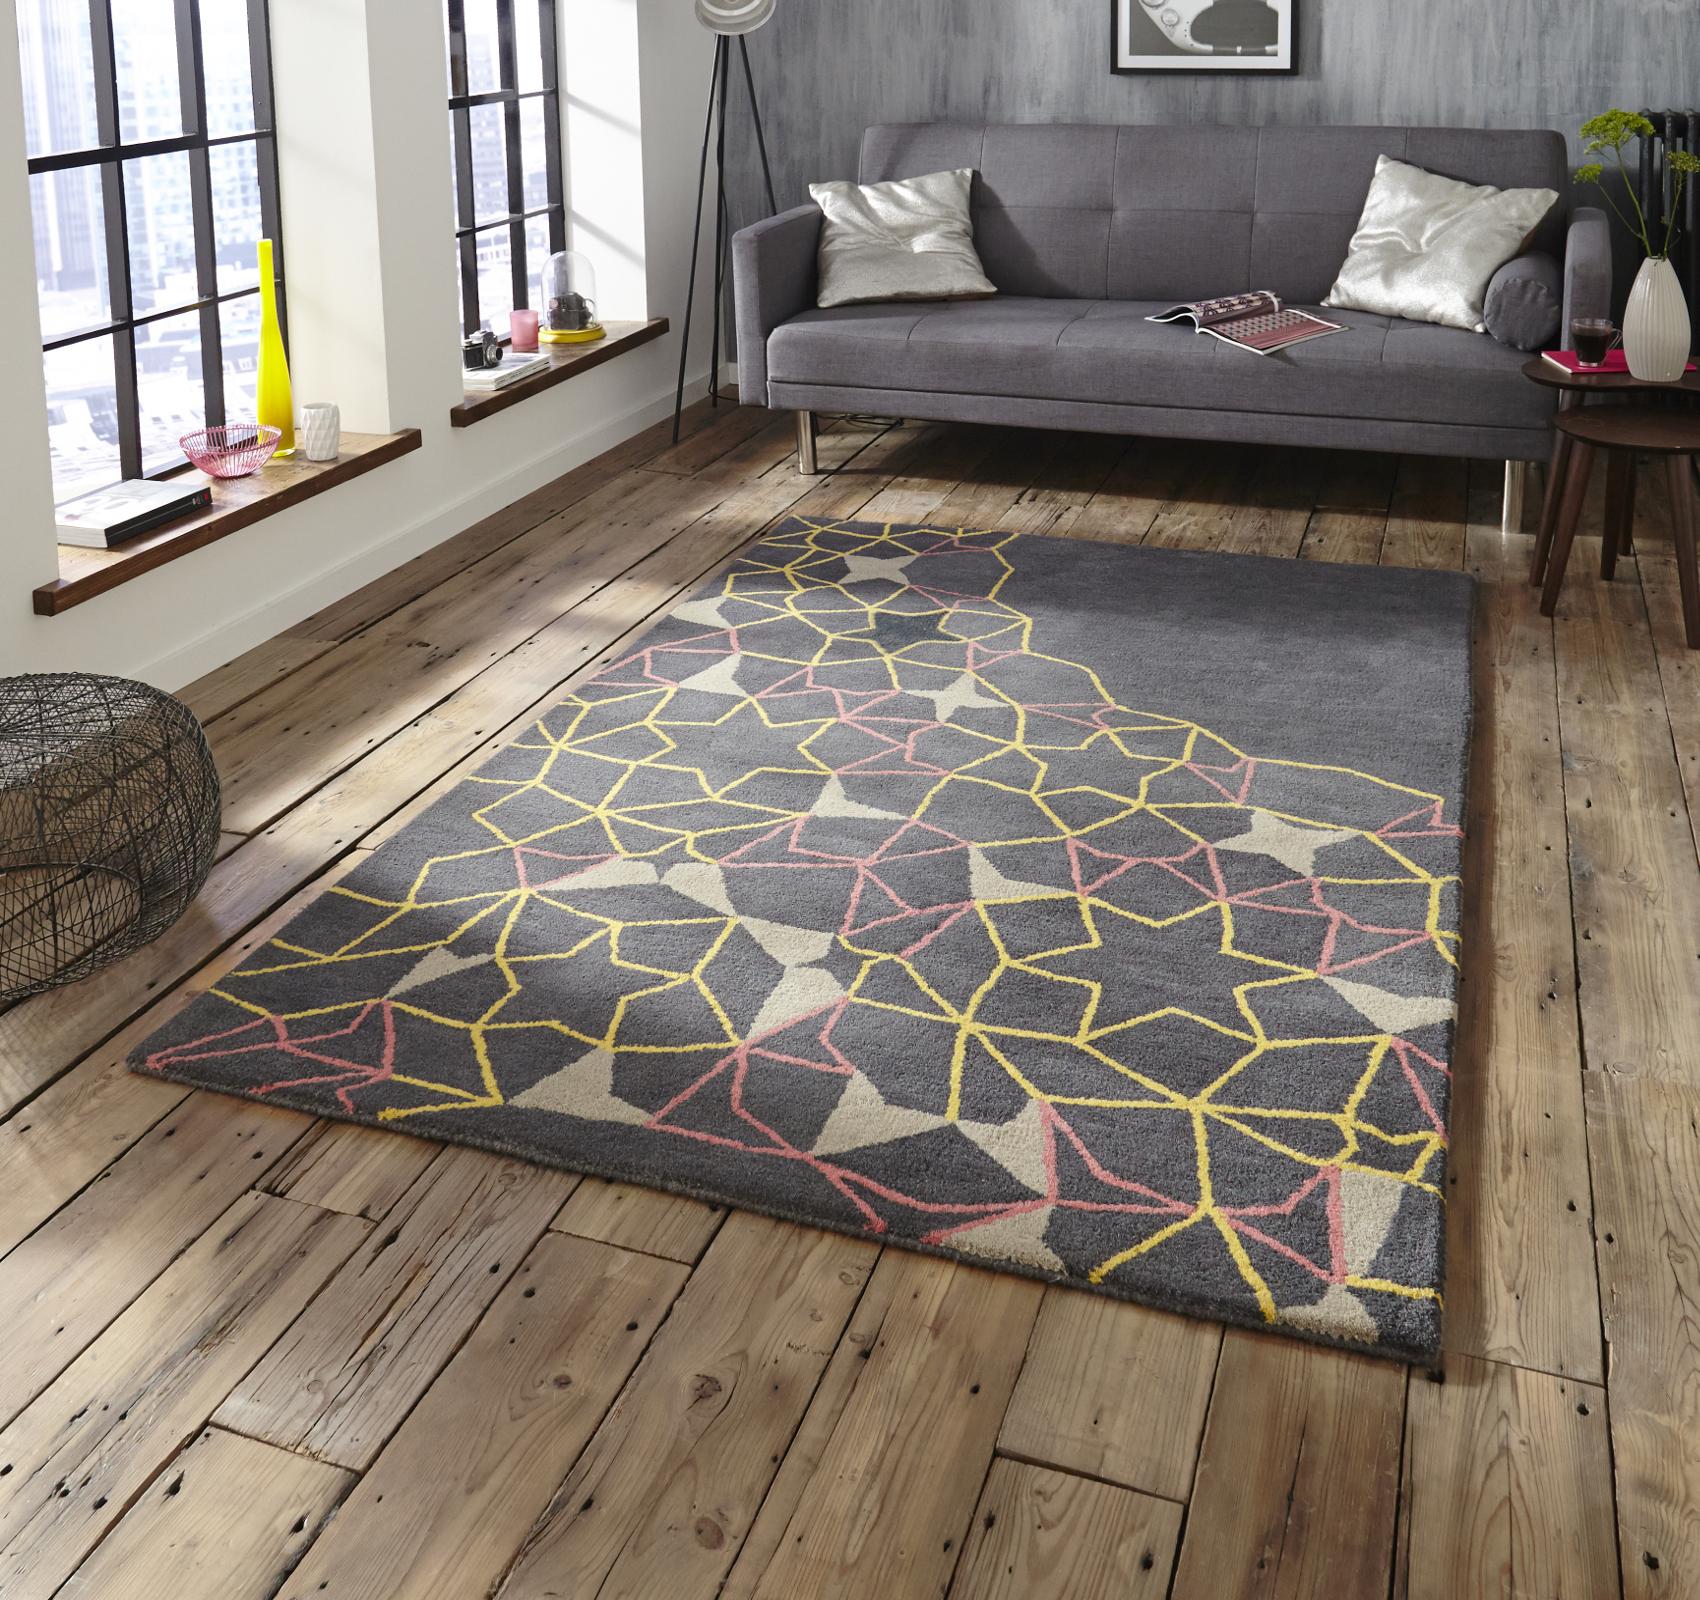 Geometric Arrows Stars 100 Wool Rug Modern Hand Tufted Mat Grey Pink Yellow